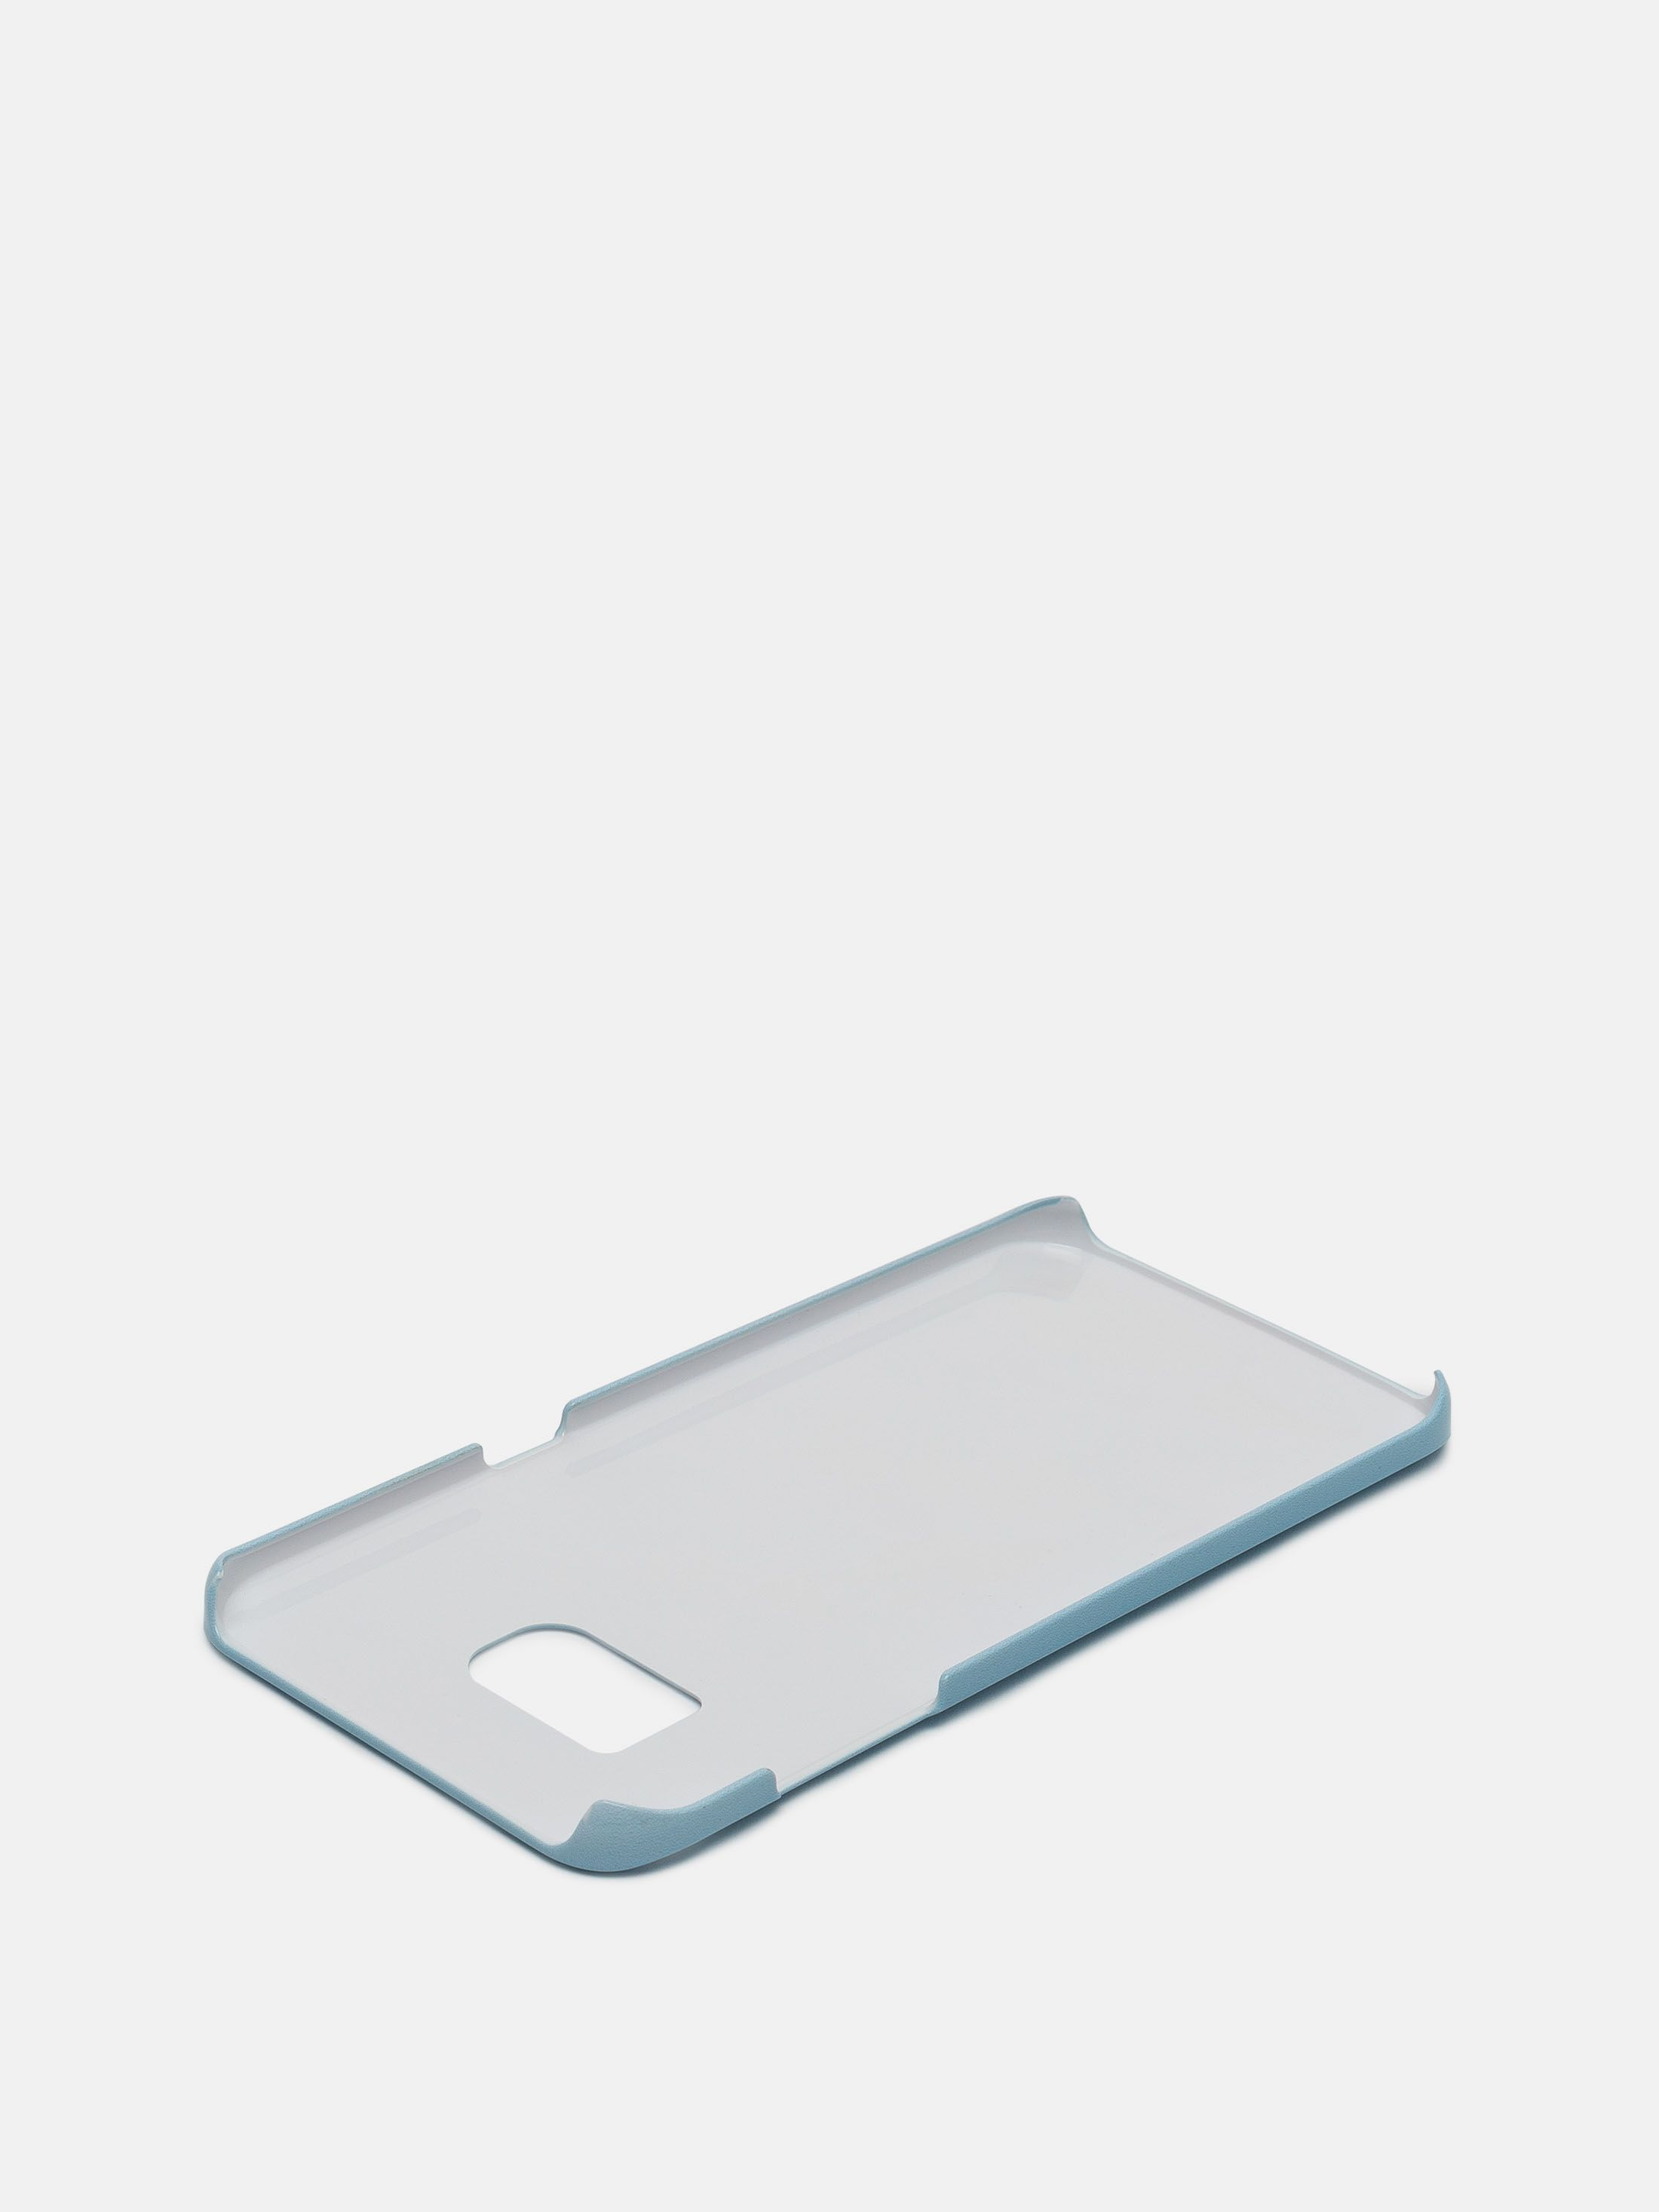 inside phone case